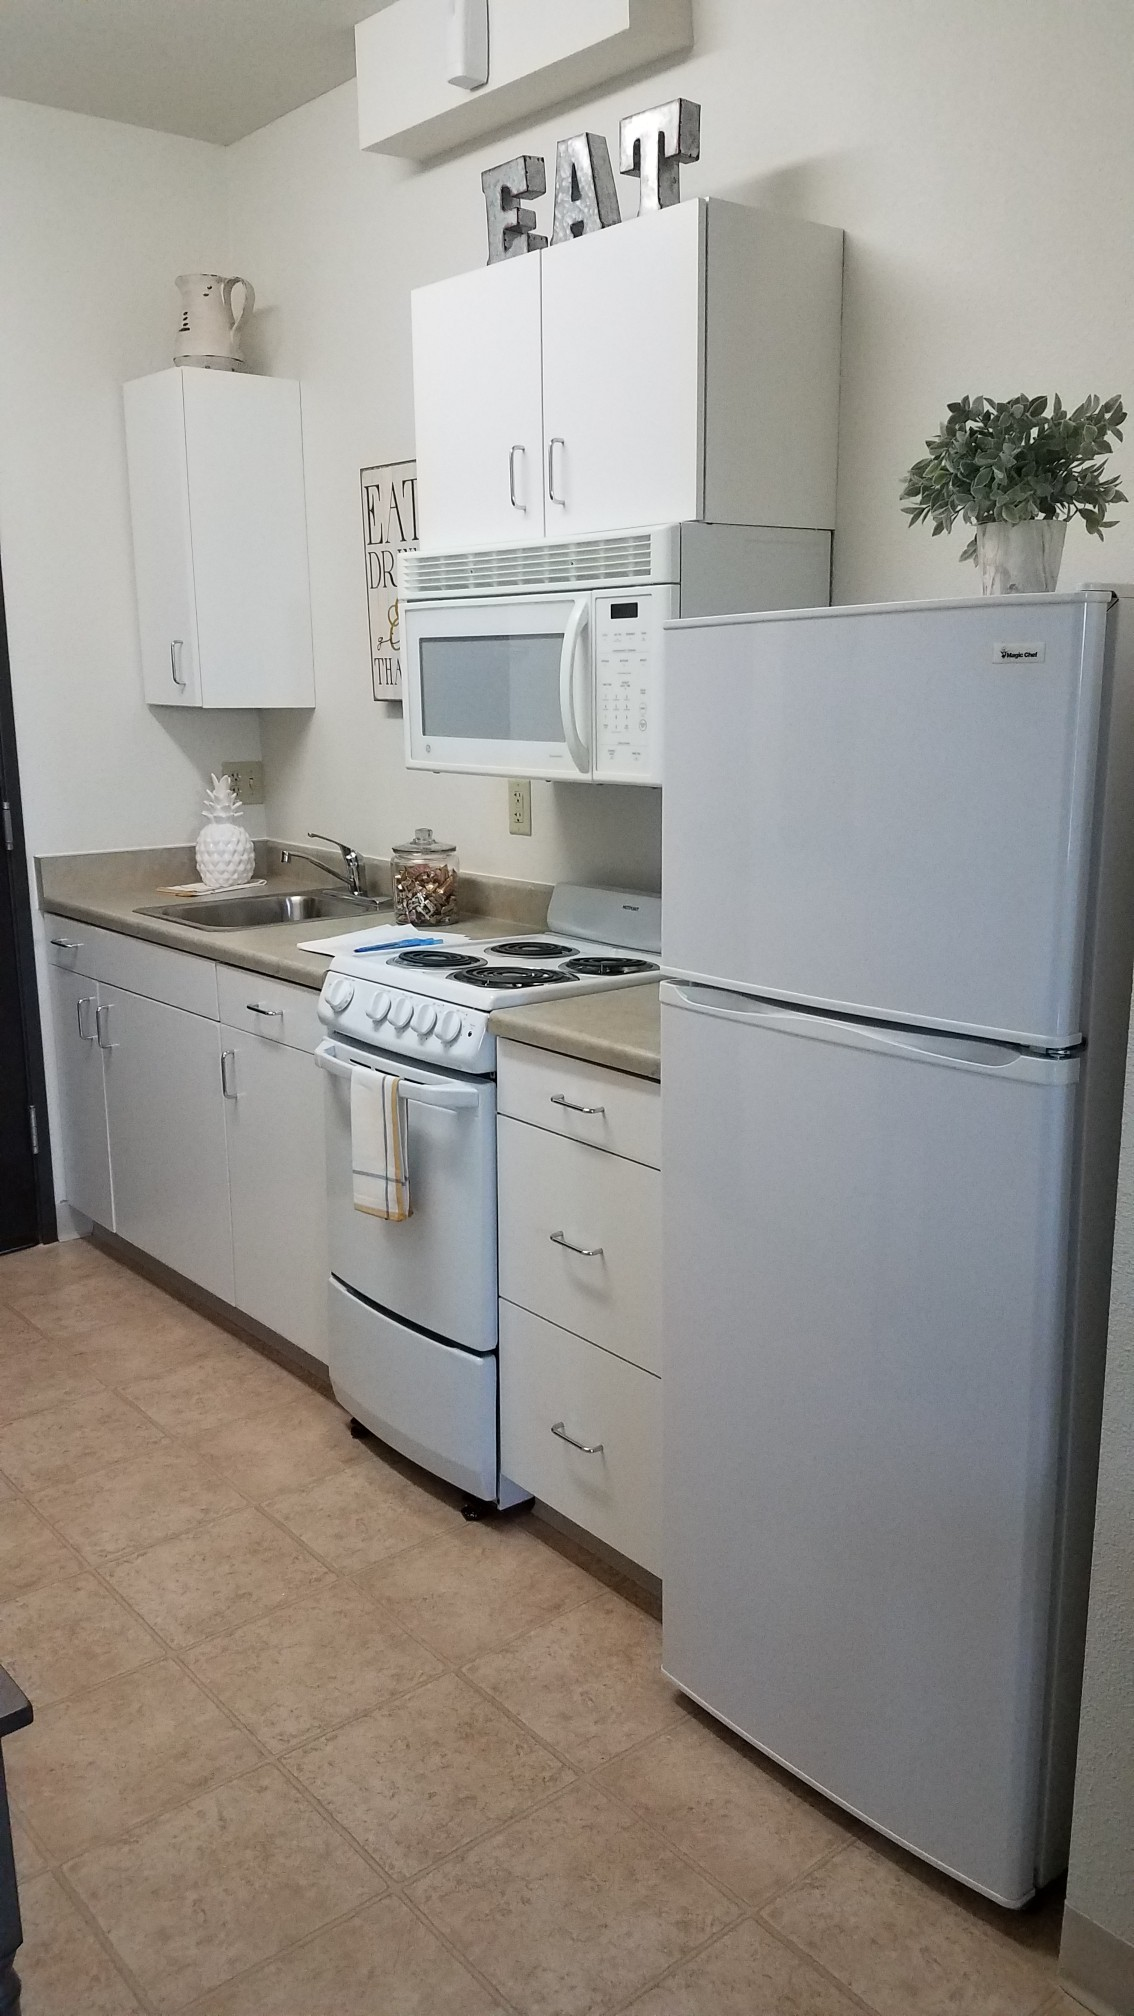 City Center Apartments - Reno rental